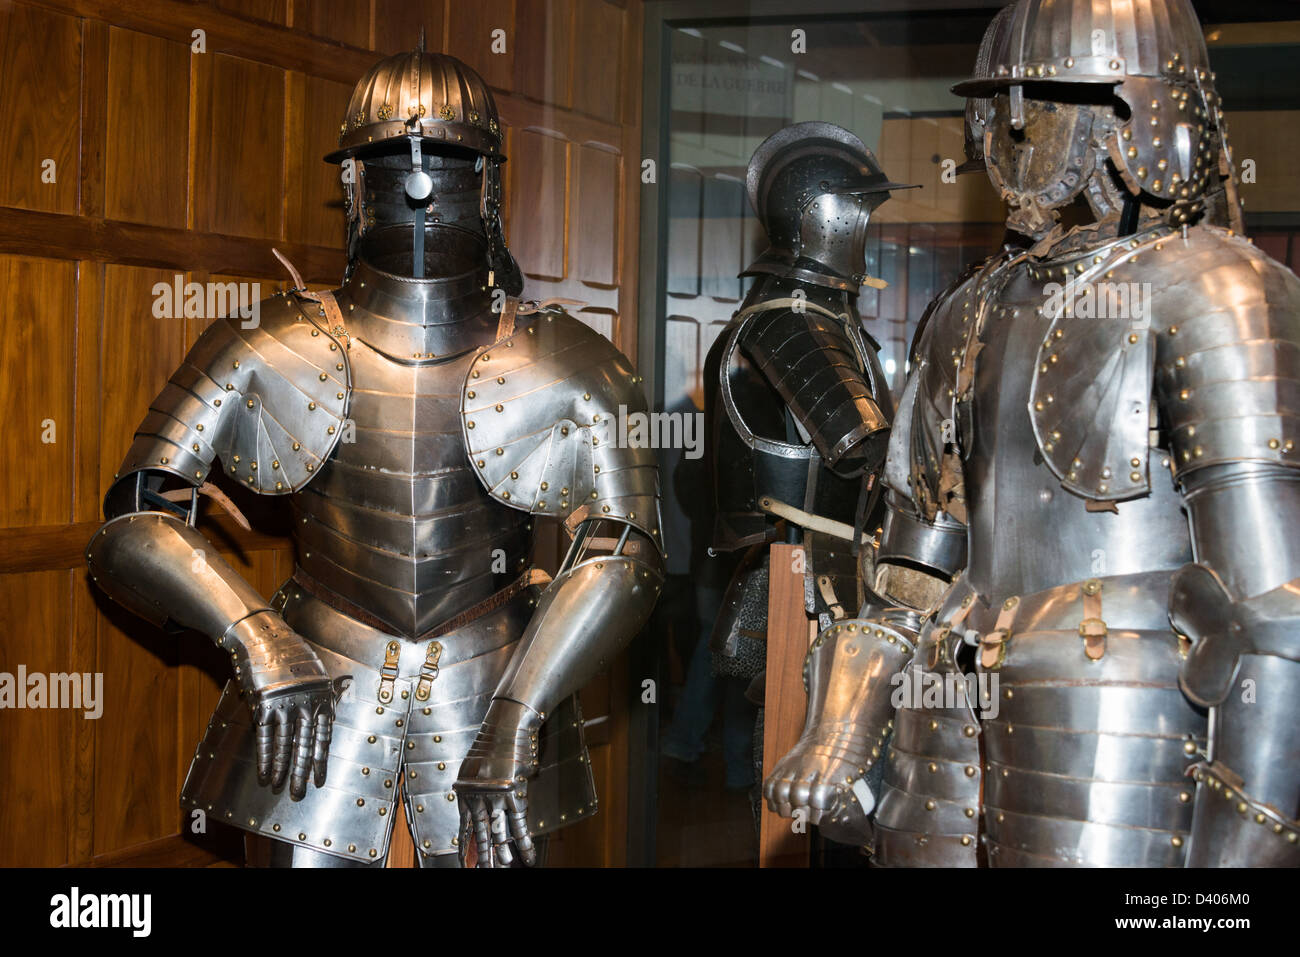 medieval suit armor on display stock photos medieval suit armor on